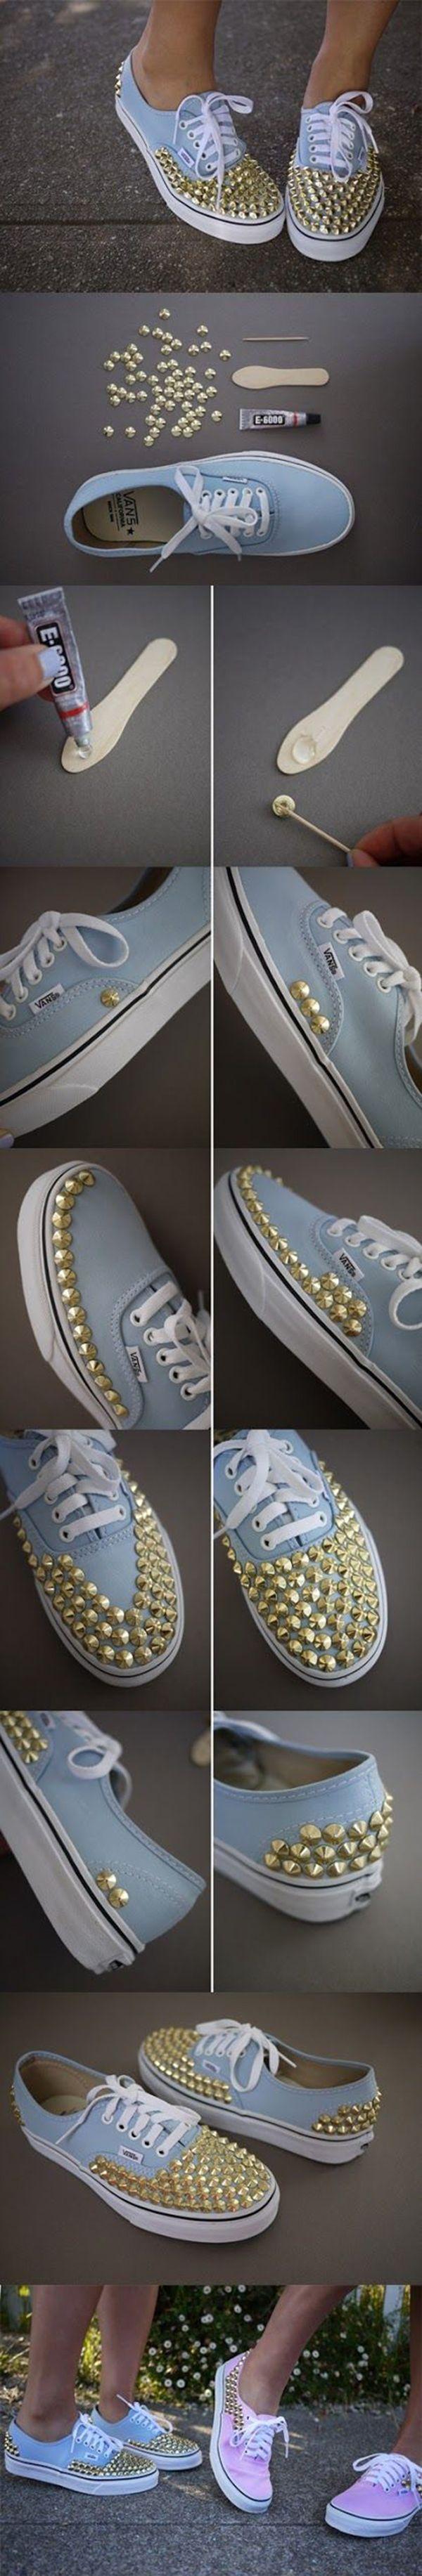 29080fe3f2e8e516ce25ac657cb03ff9--studded-sneakers-diy-outfits Elegantes 3 Zimmer Wohnung Lörrach Dekorationen